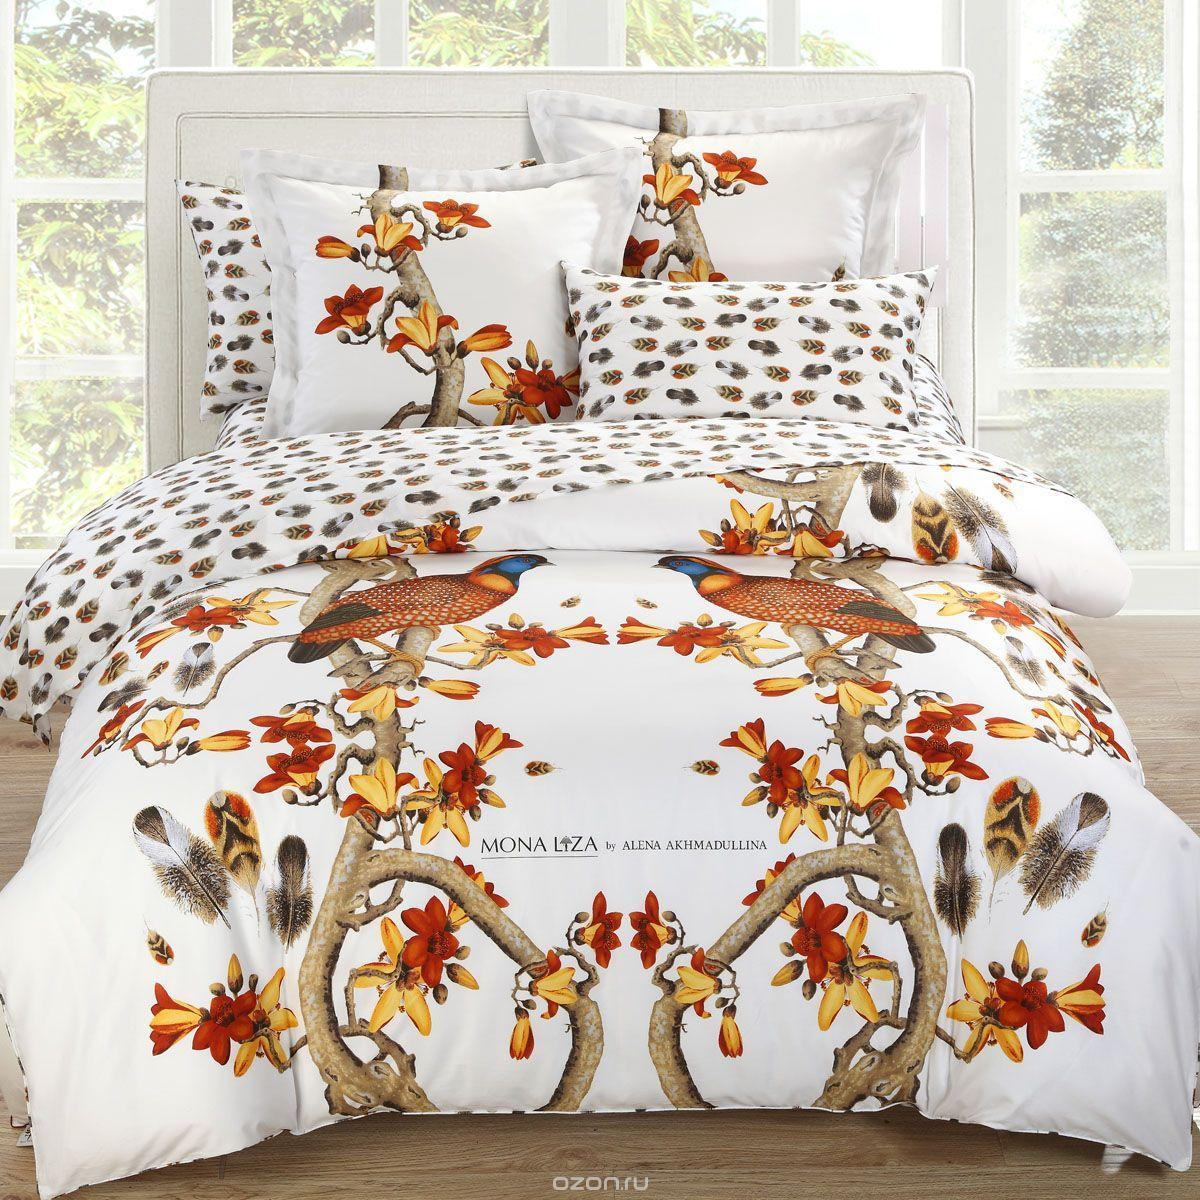 Комплект белья Pheasant (2-спальный КПБ, сатин панно, наволочки 50х70, 70х70)